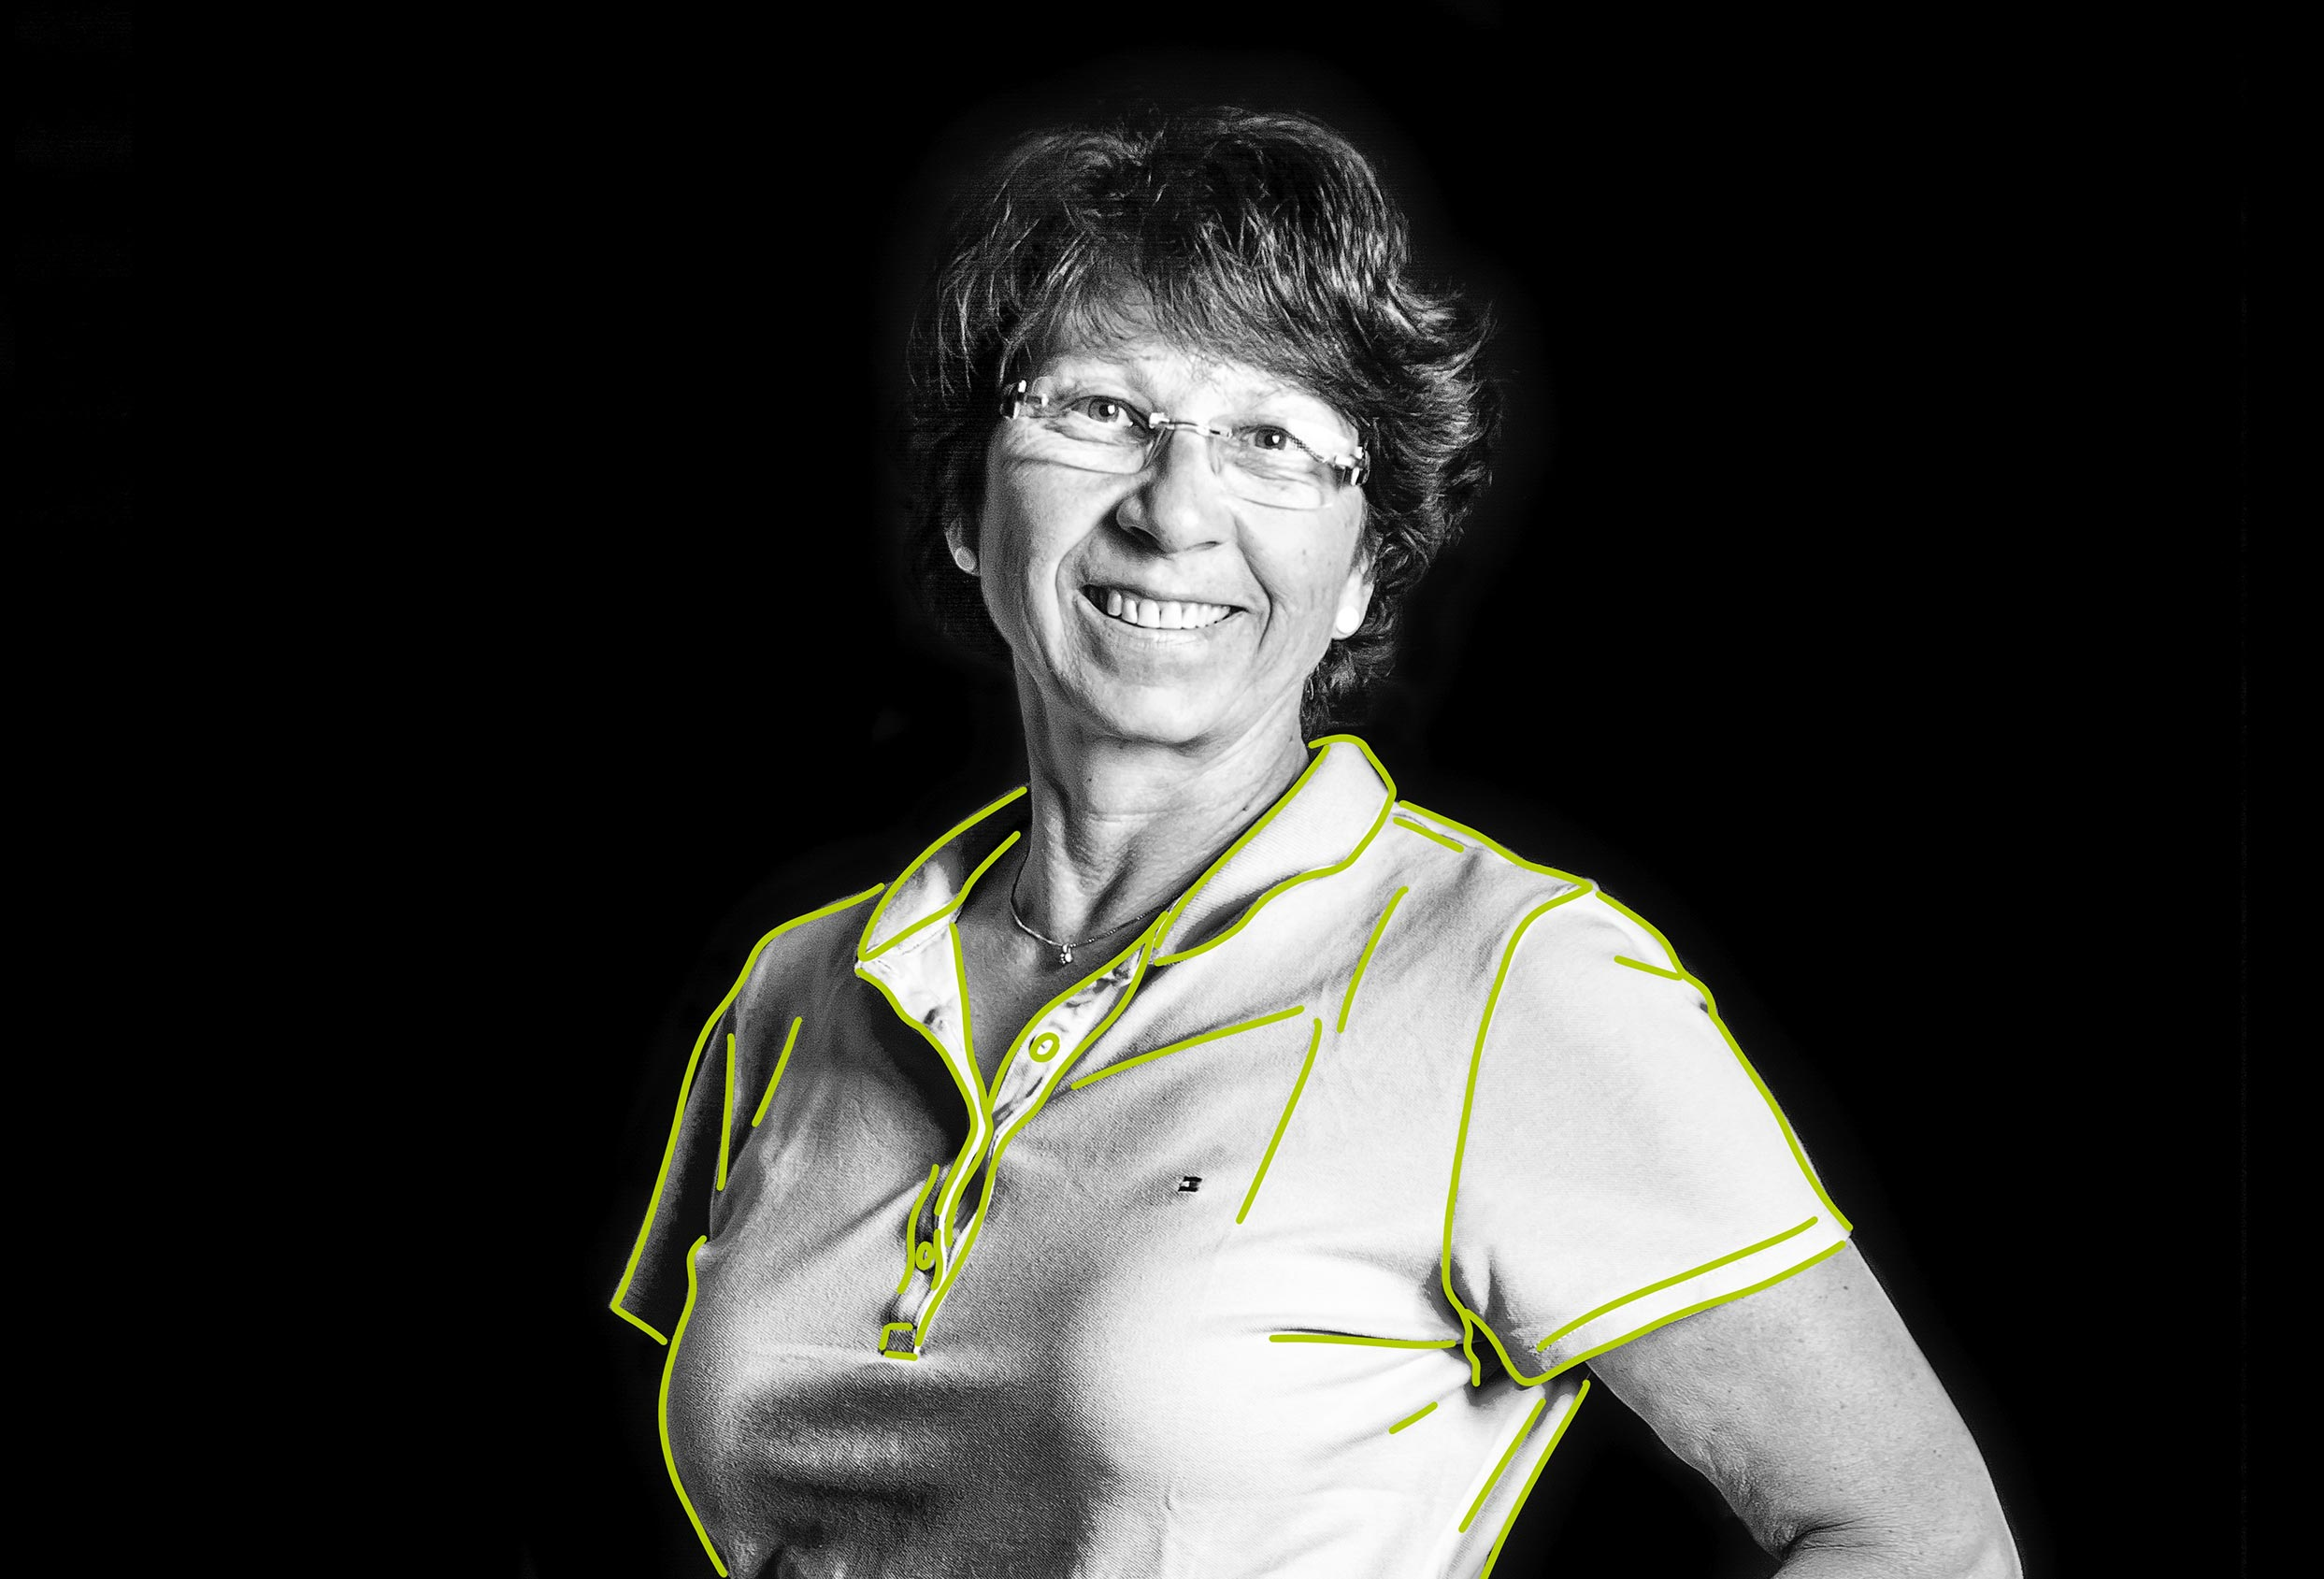 Sonja Maier